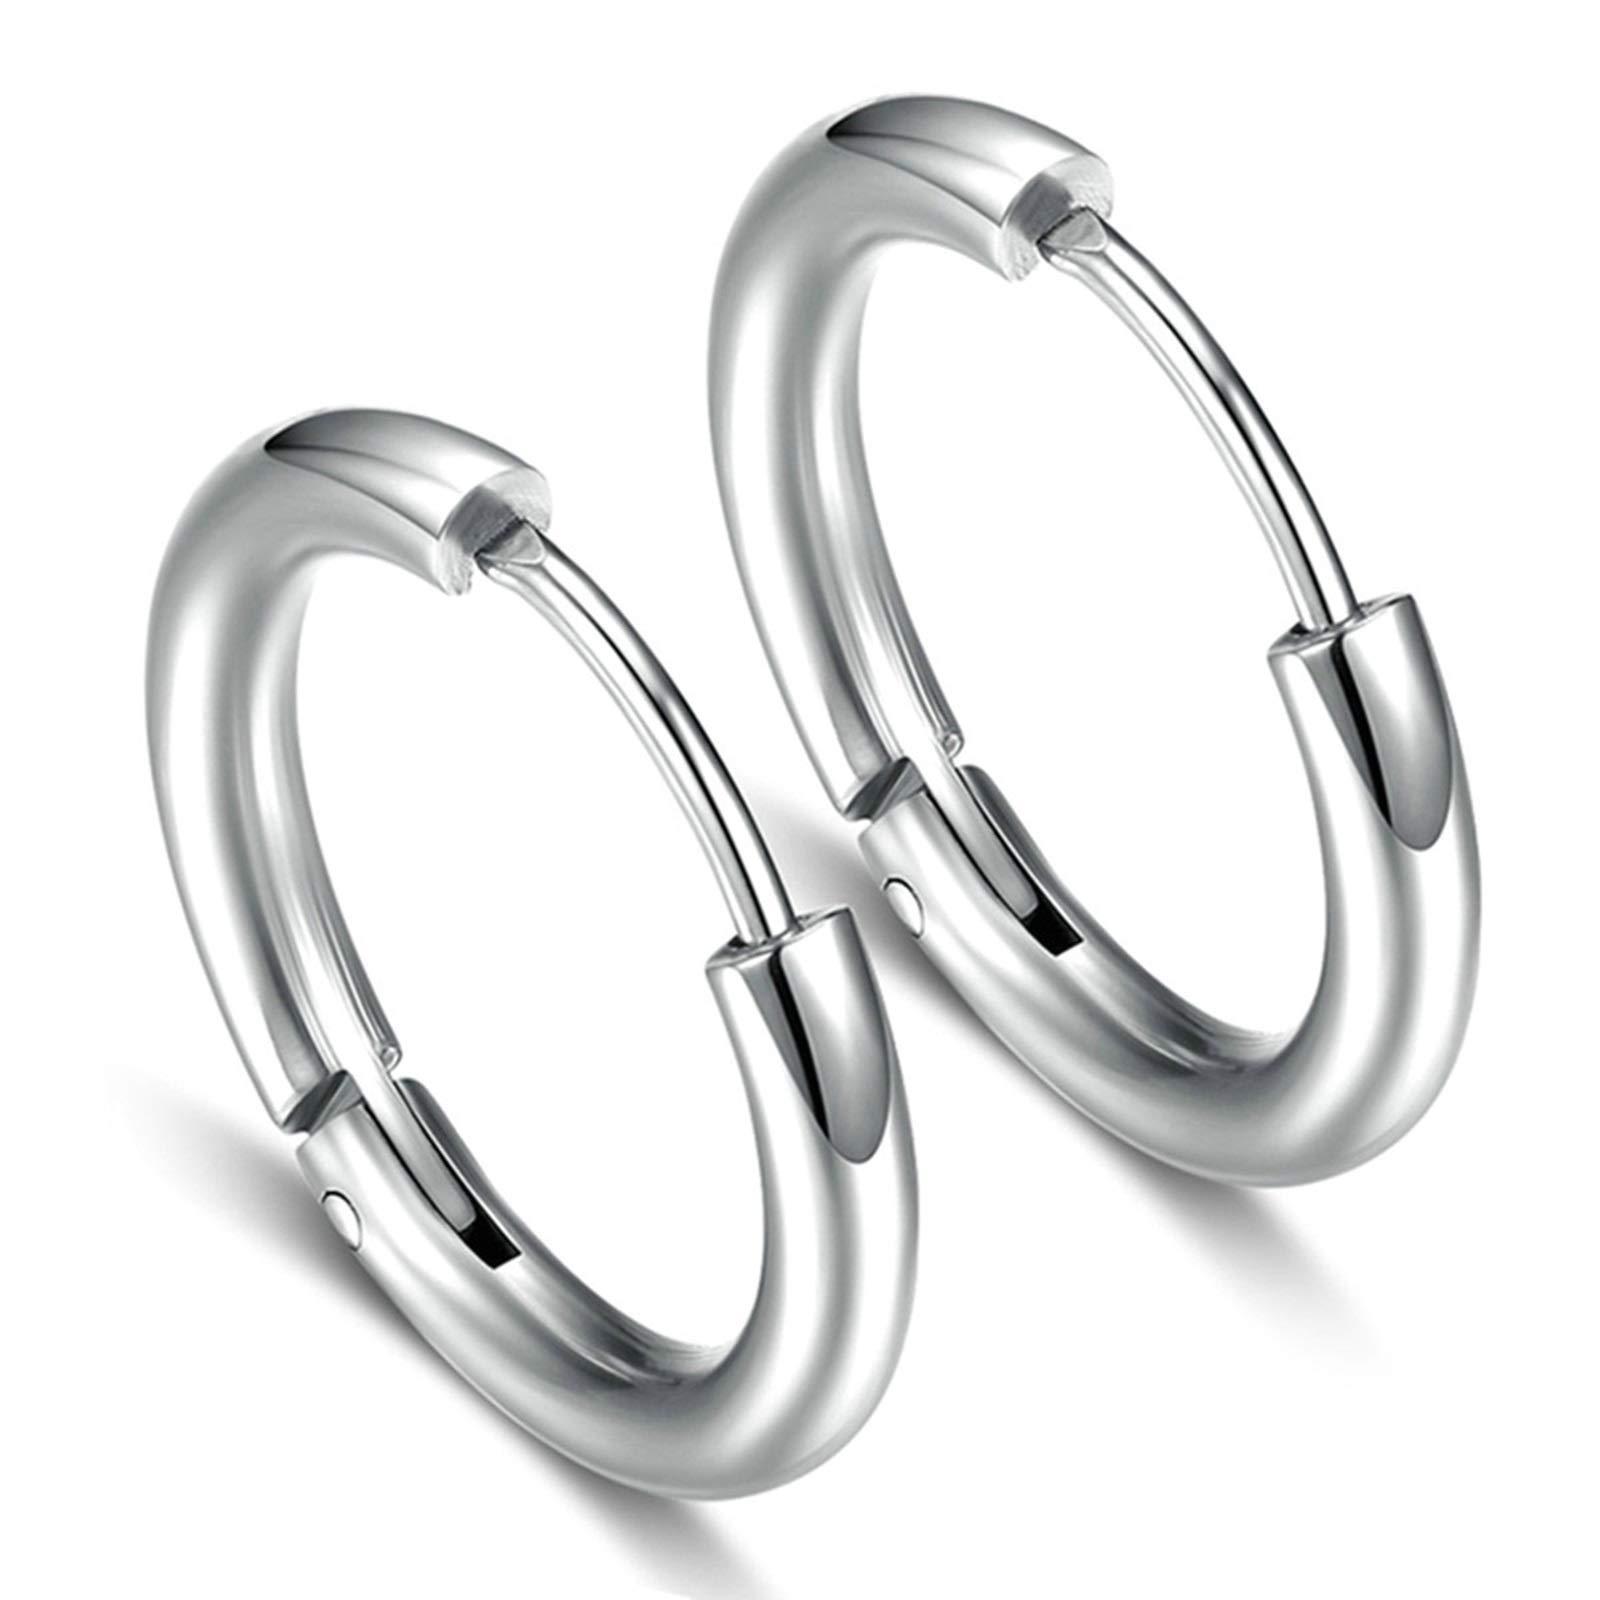 Aokarry Surfical Steel Hoop Earrings Wide 2.5MM Women's Men's 1 Pair Silver 12MM